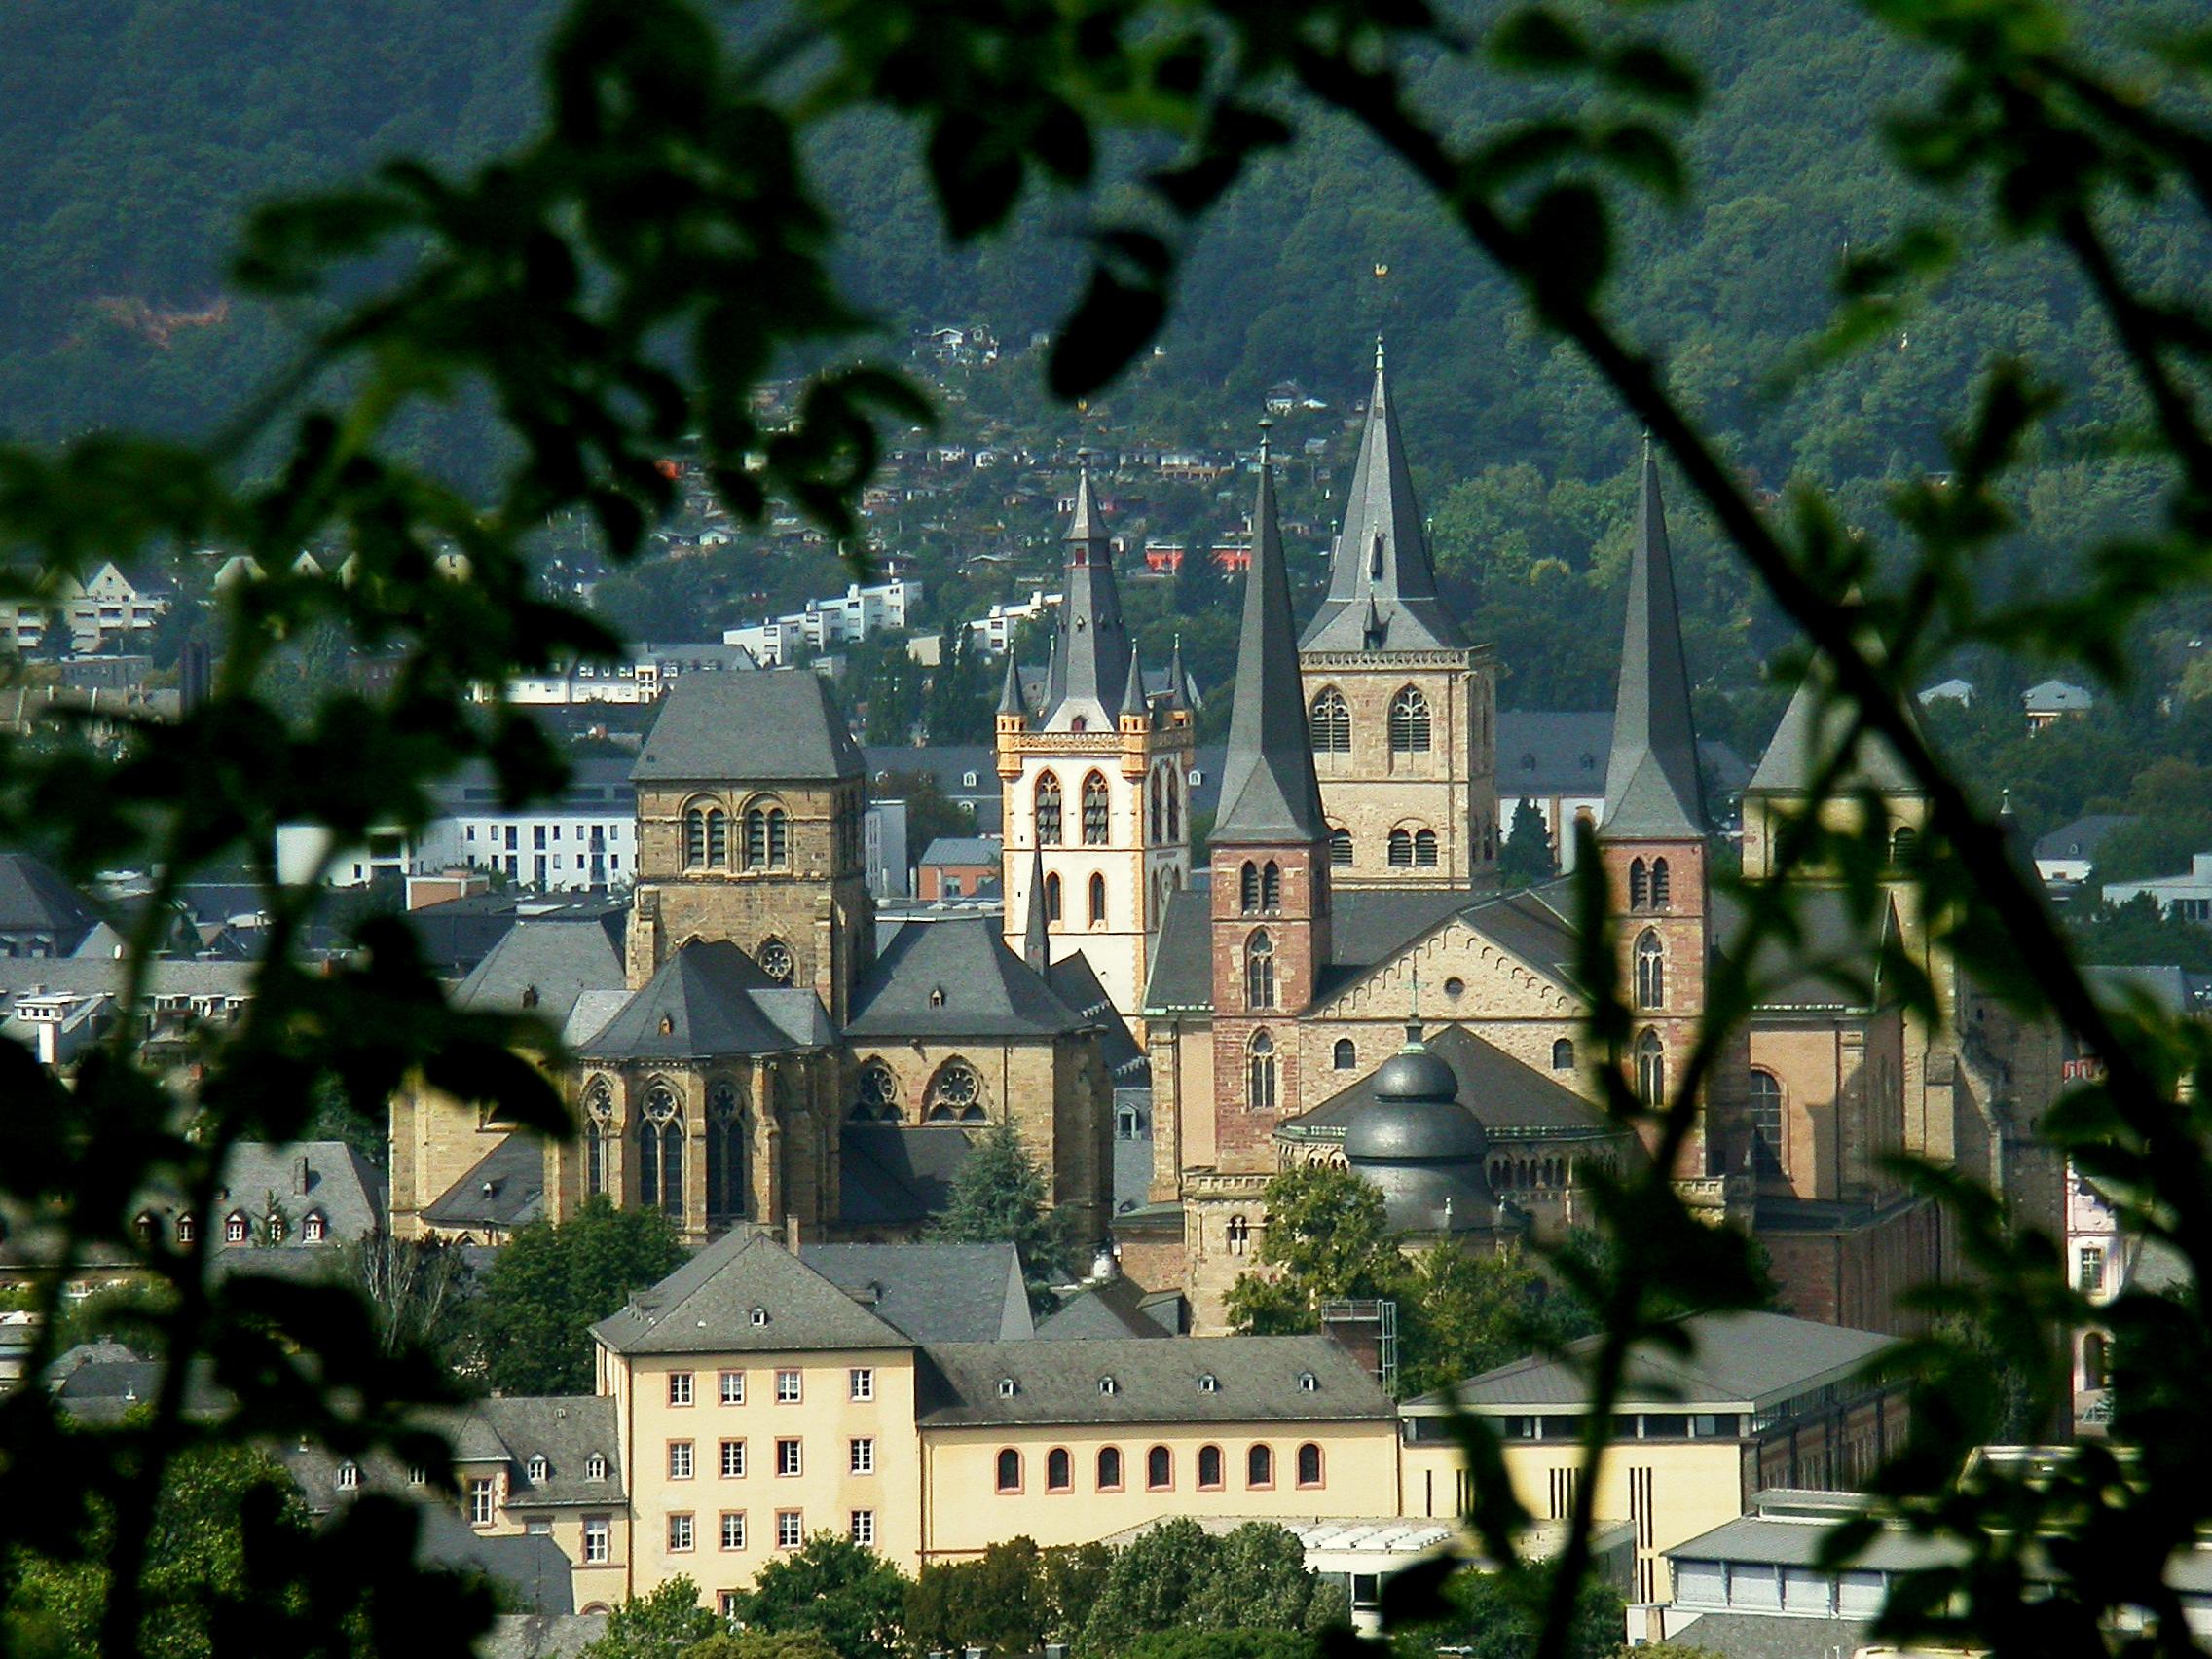 Panorama - Trierer Dom, Liebfrauen, St. Gangolf